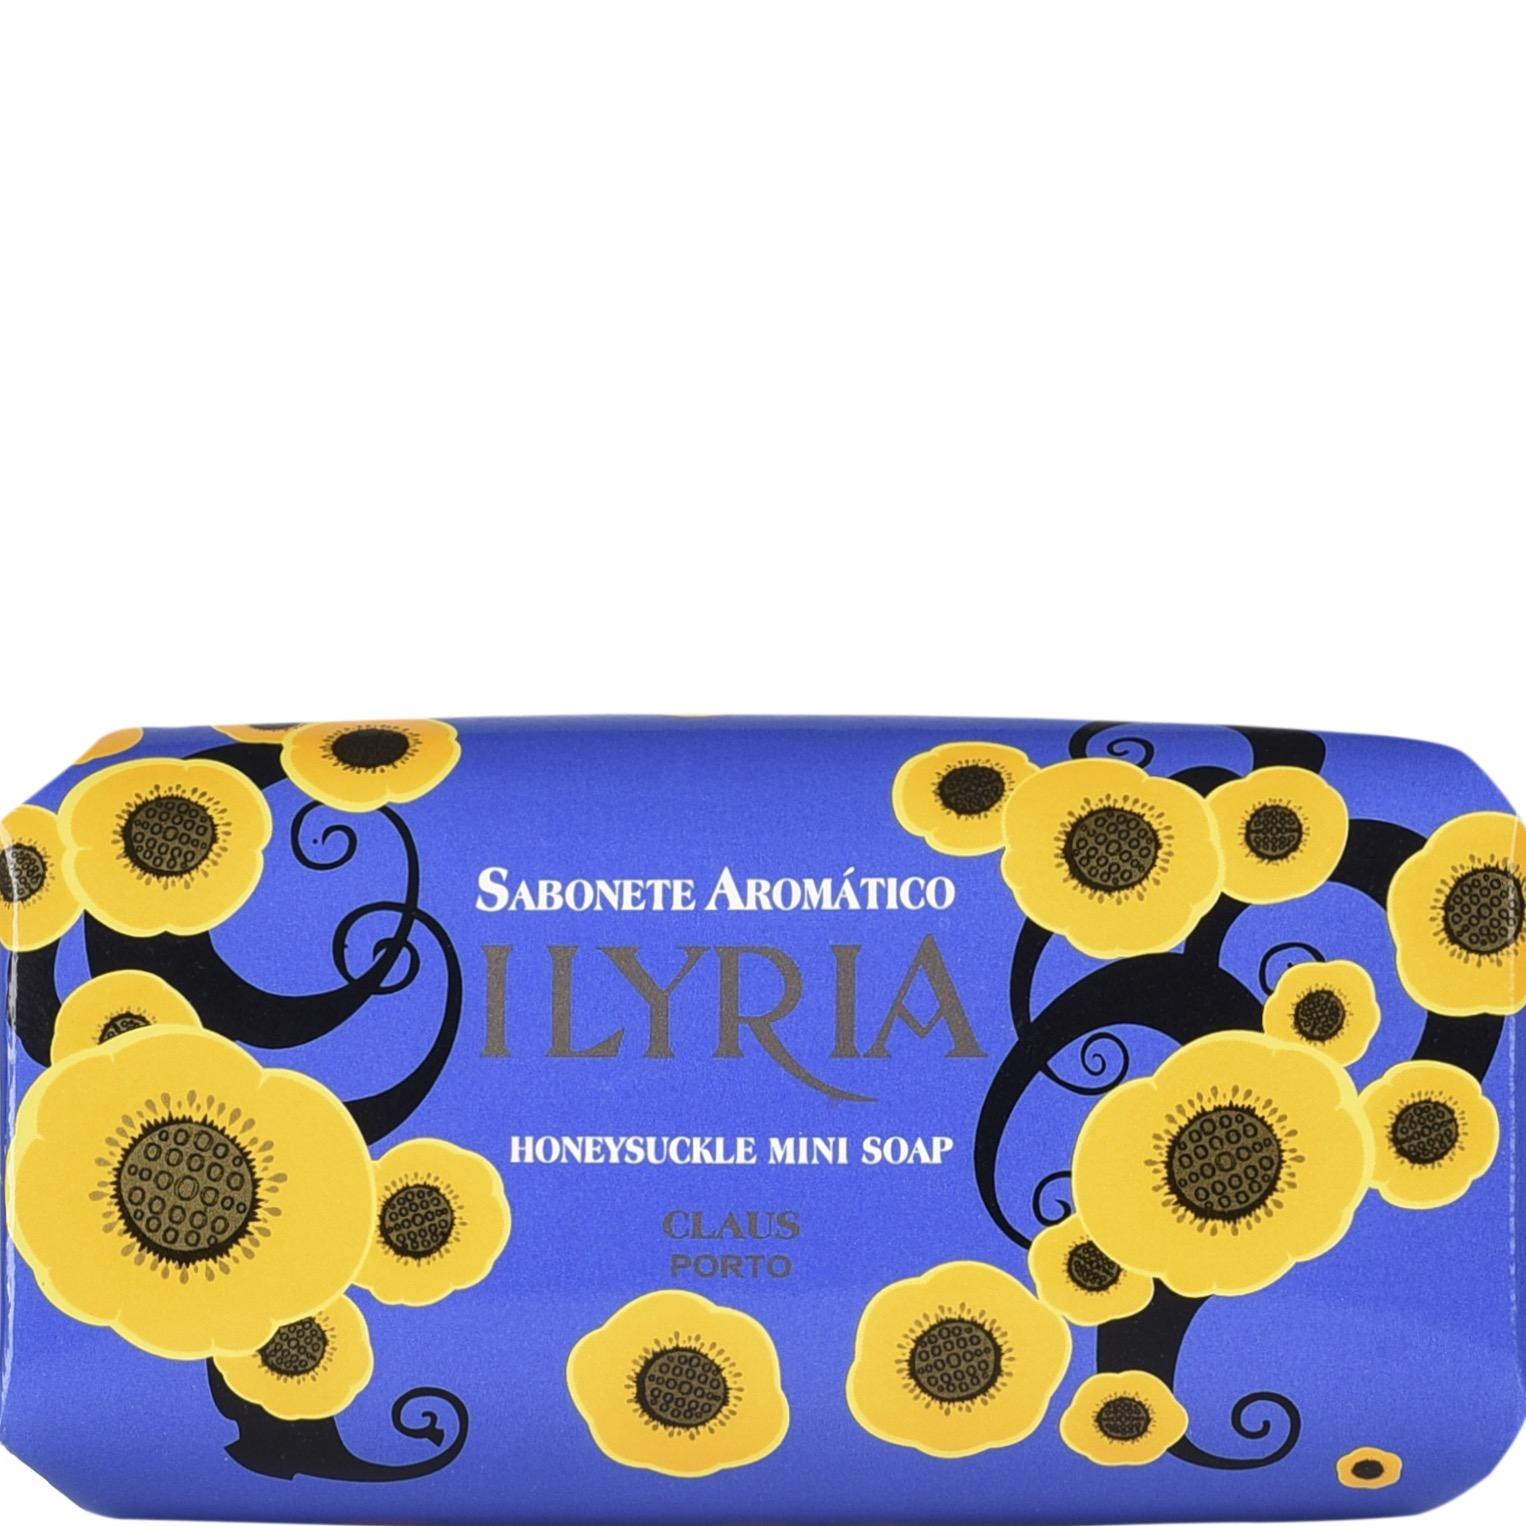 Mini Soap Ilyria / Honeysuckle